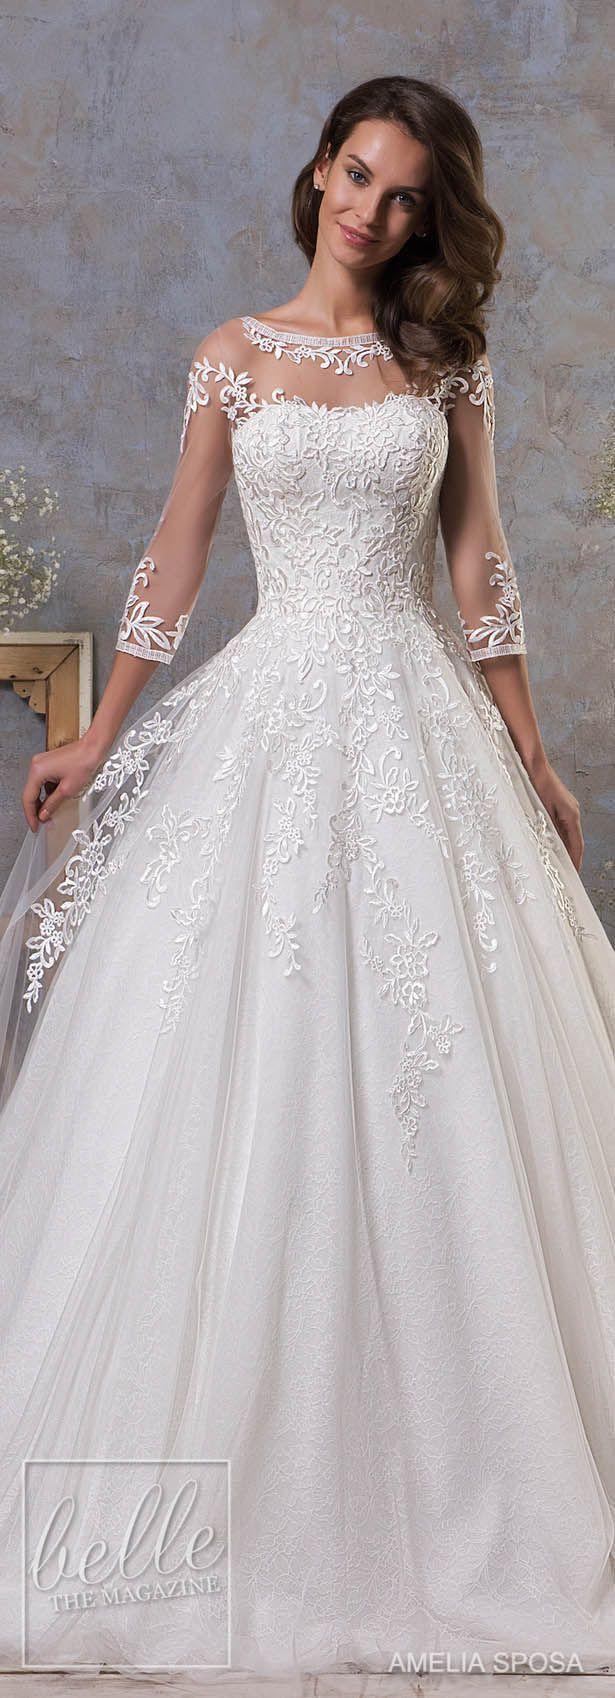 Amelia sposa fall wedding dresses weddingdresses Свадебные